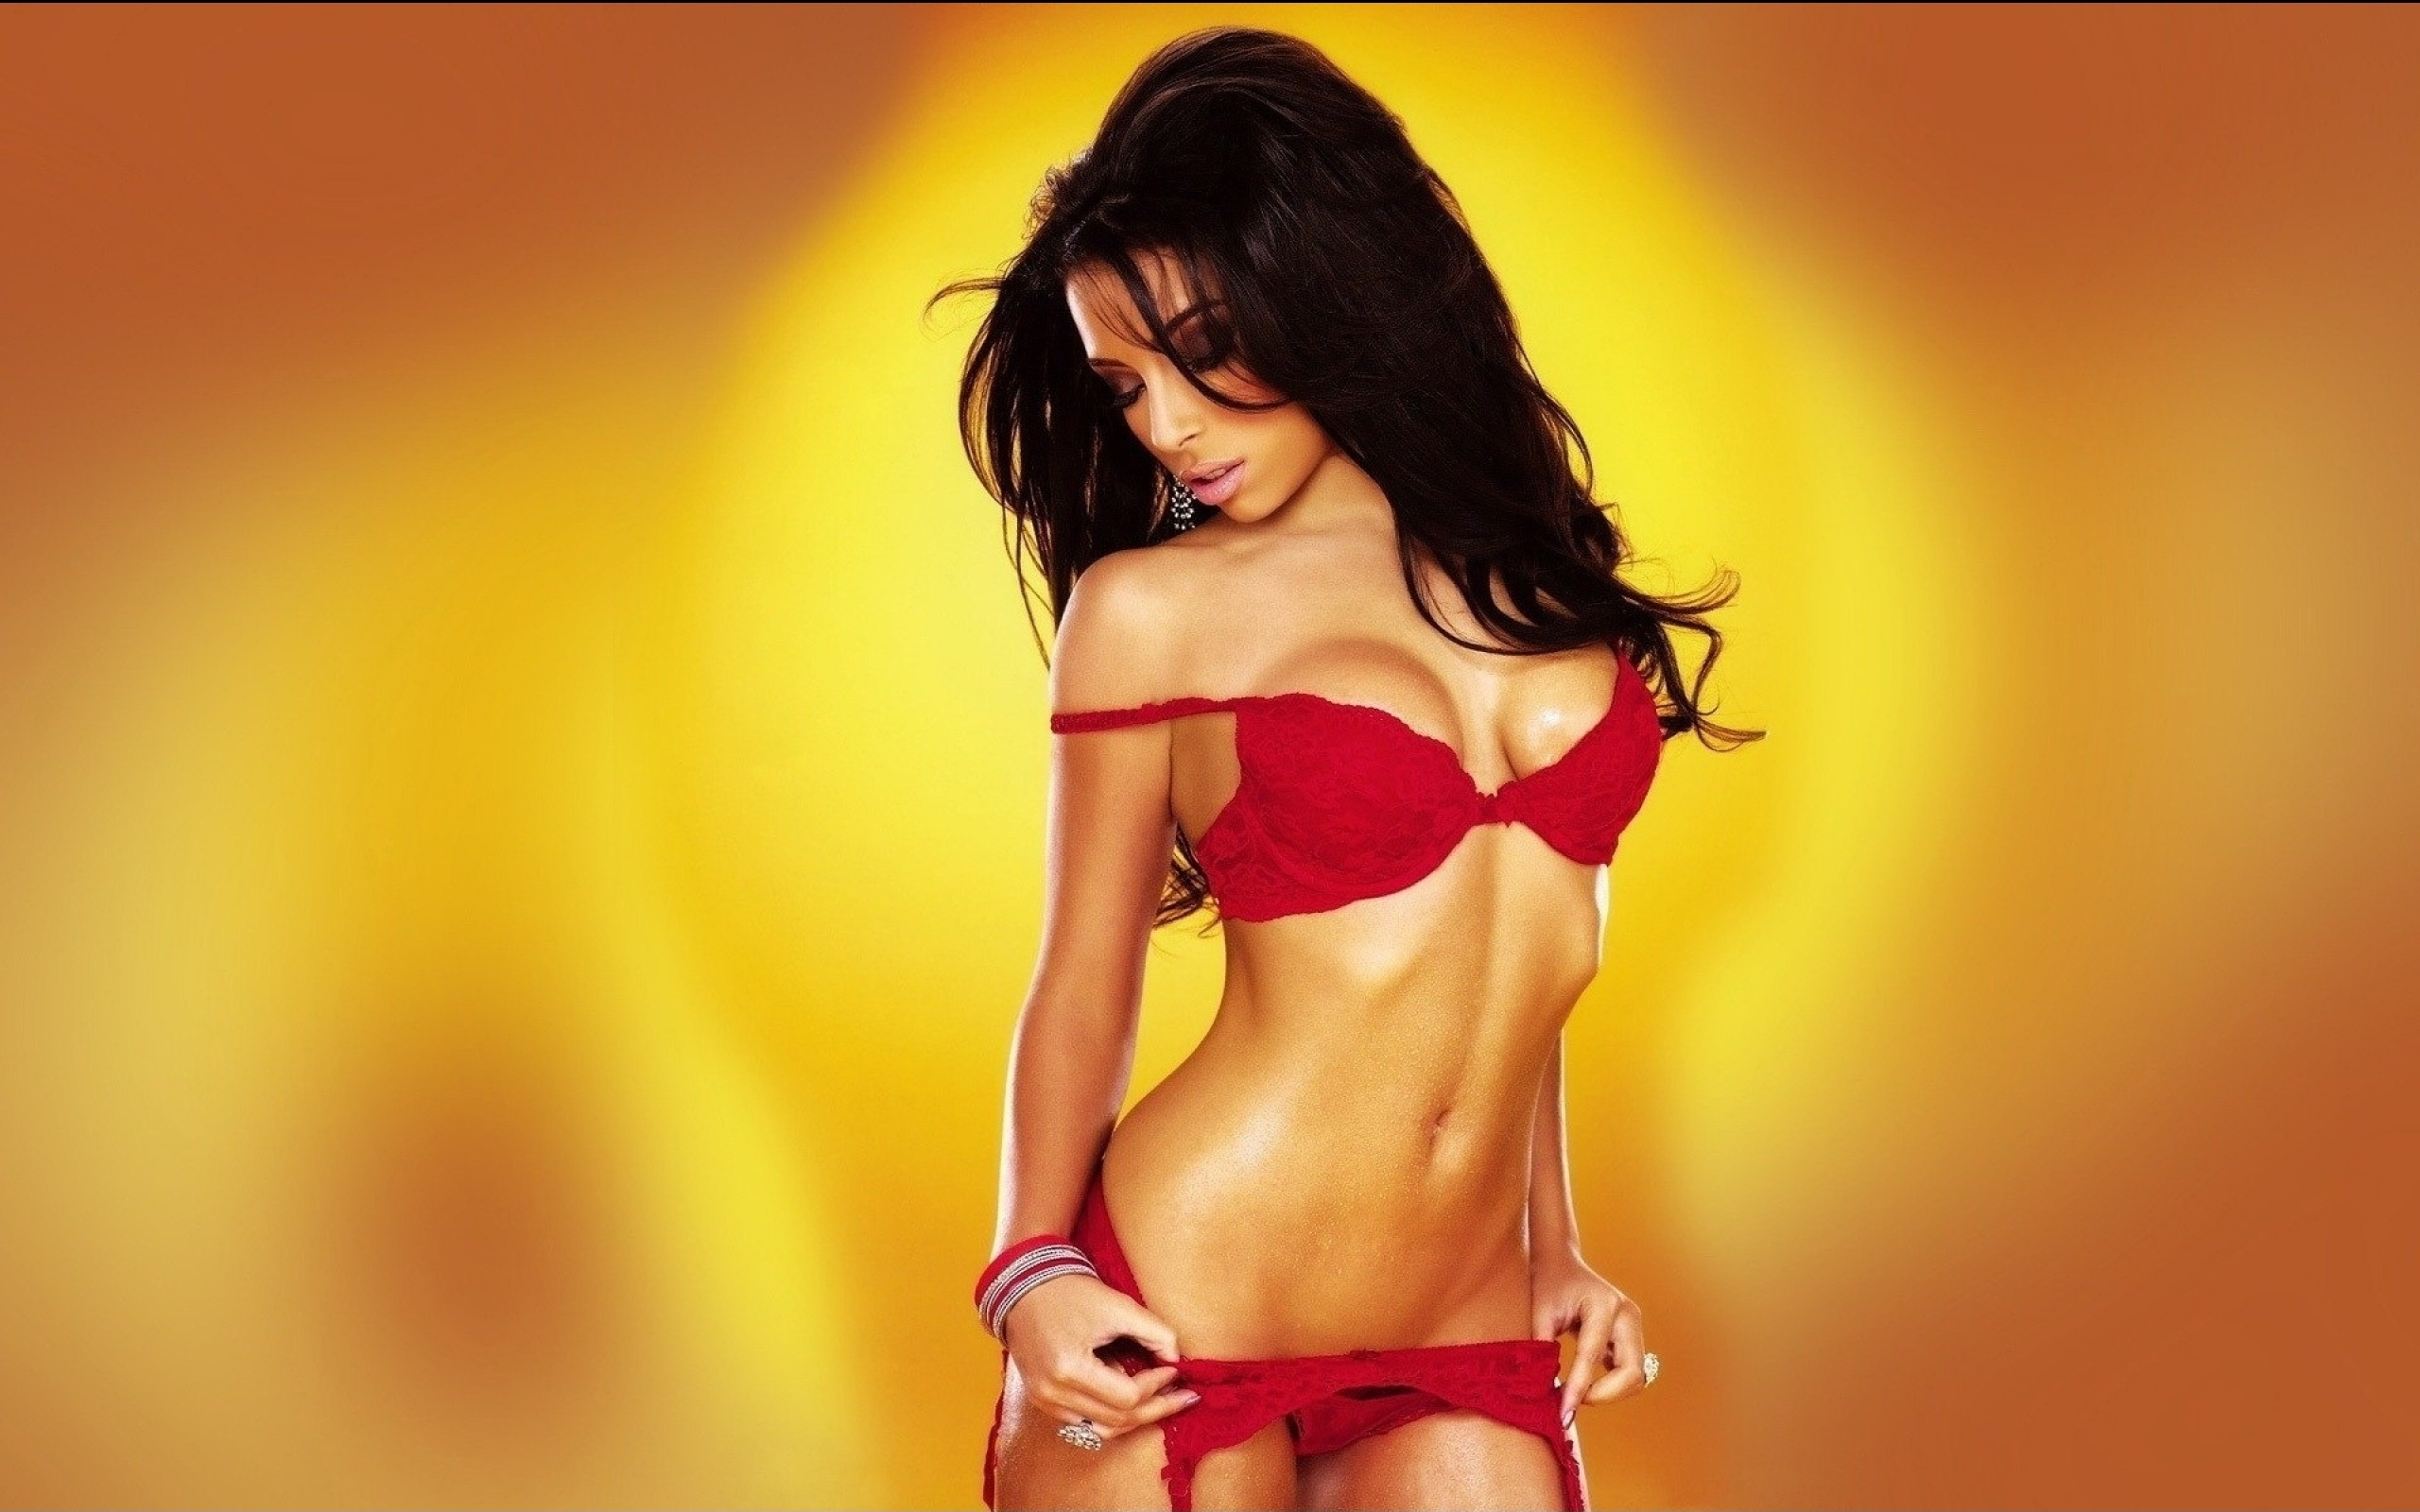 Sexy girl sayings, sex teen taboo